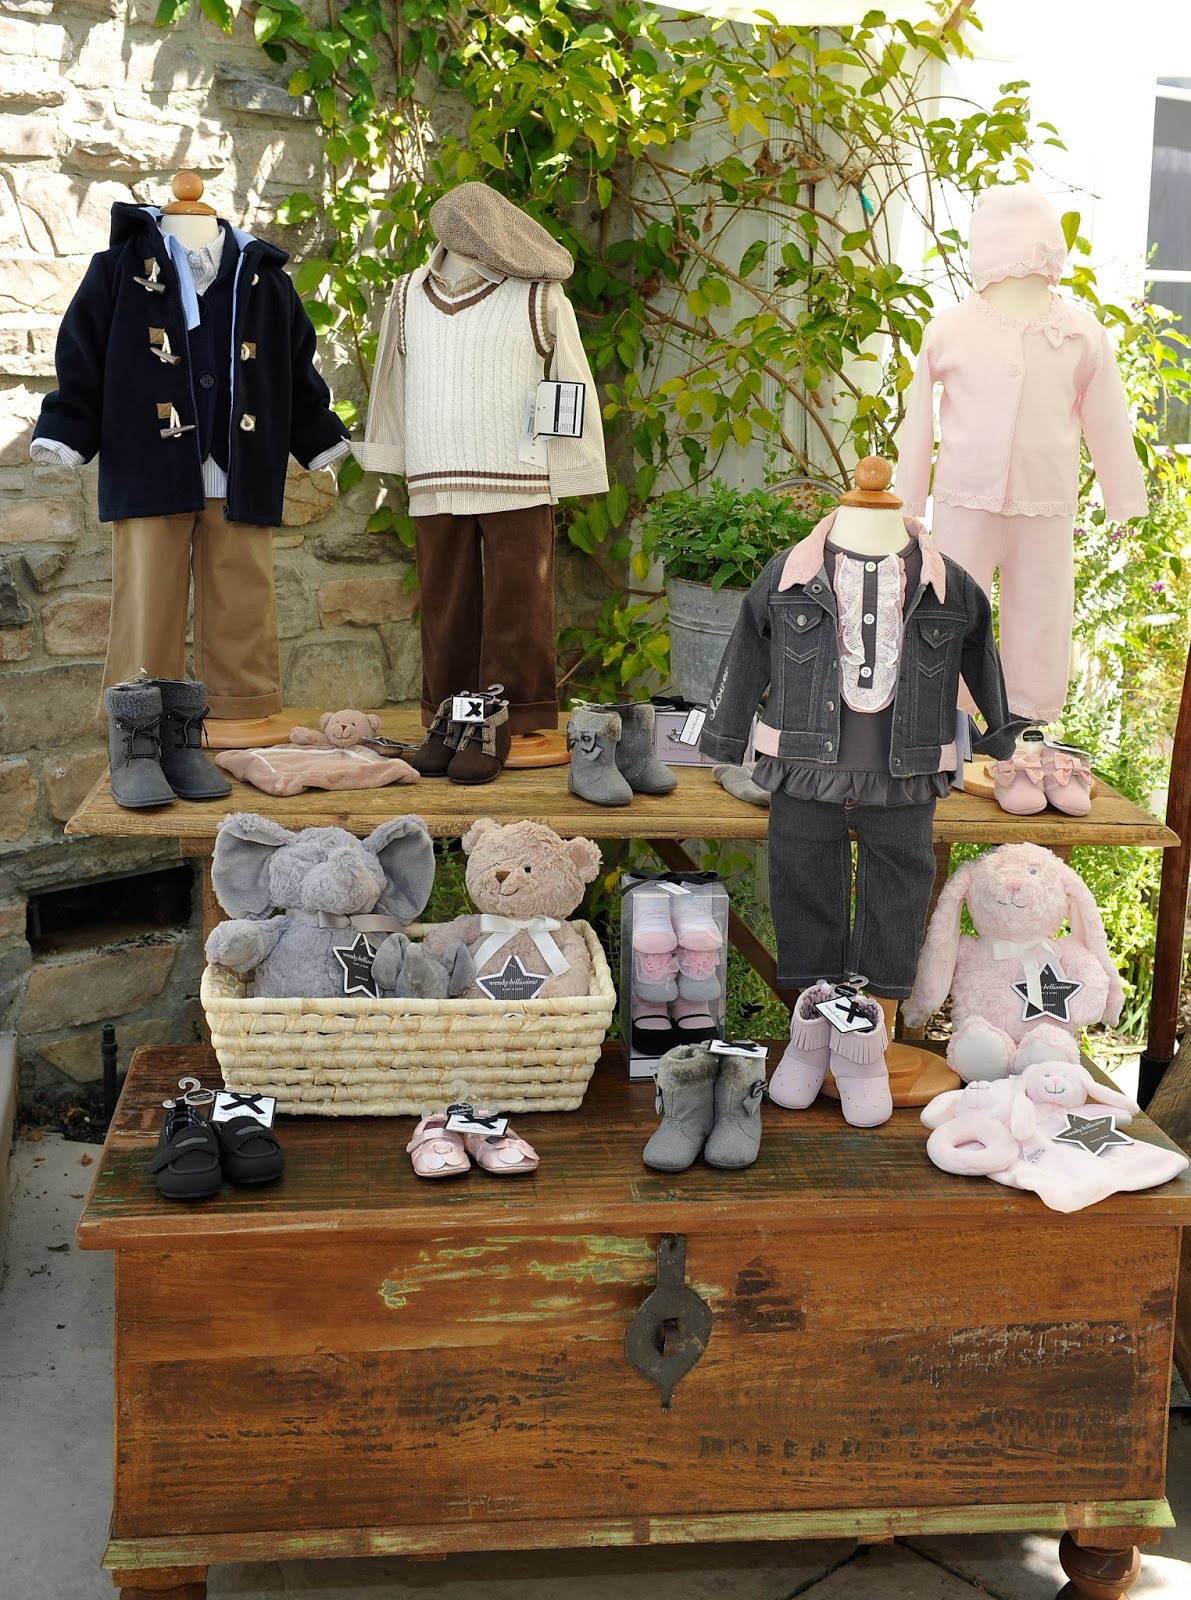 Designer Baby Boy Diaper Bags Diaper bags, baby gear and